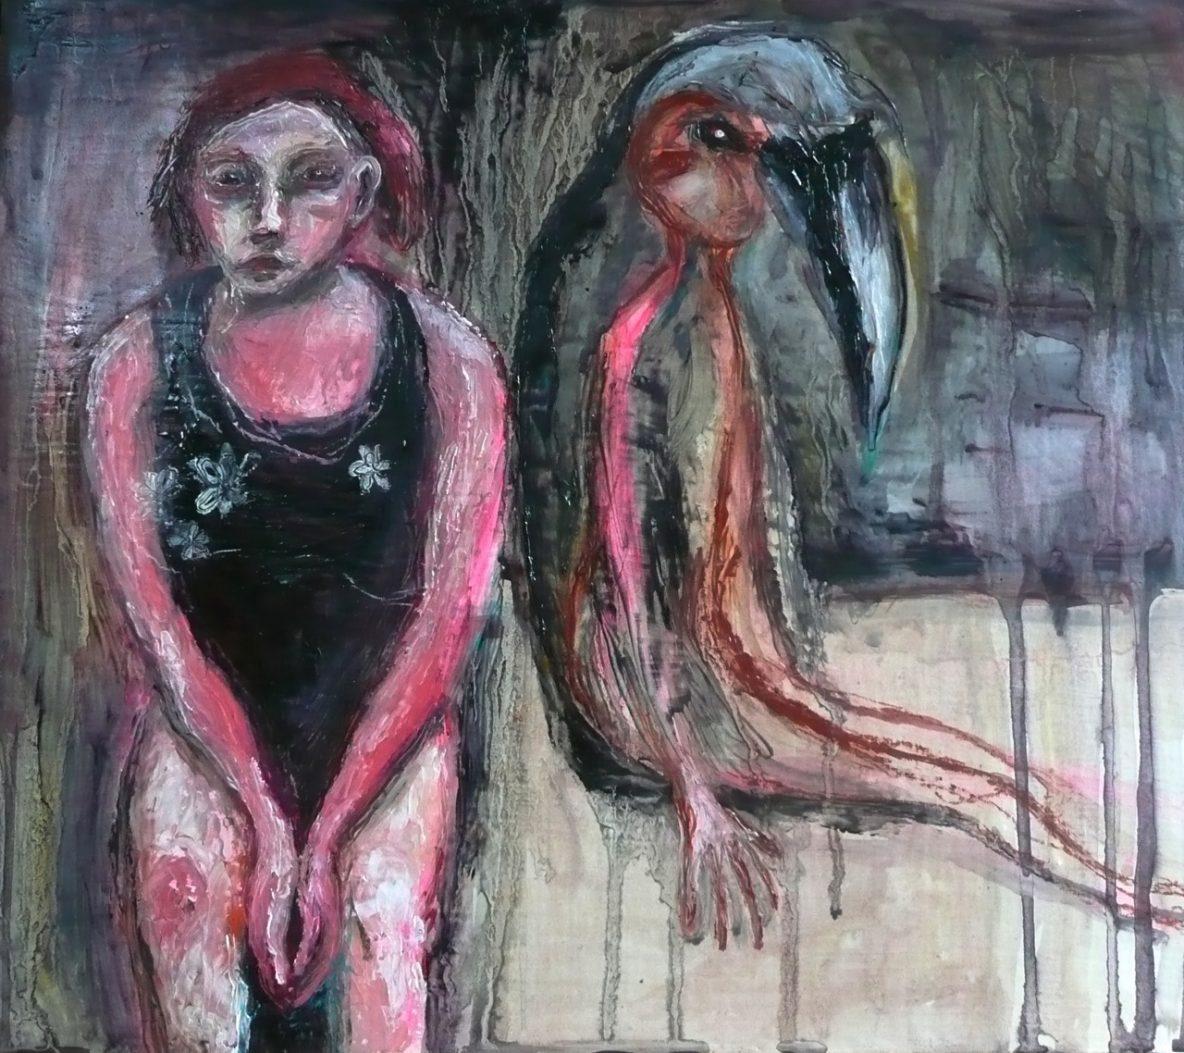 Girl-with-child-turning-crowlike